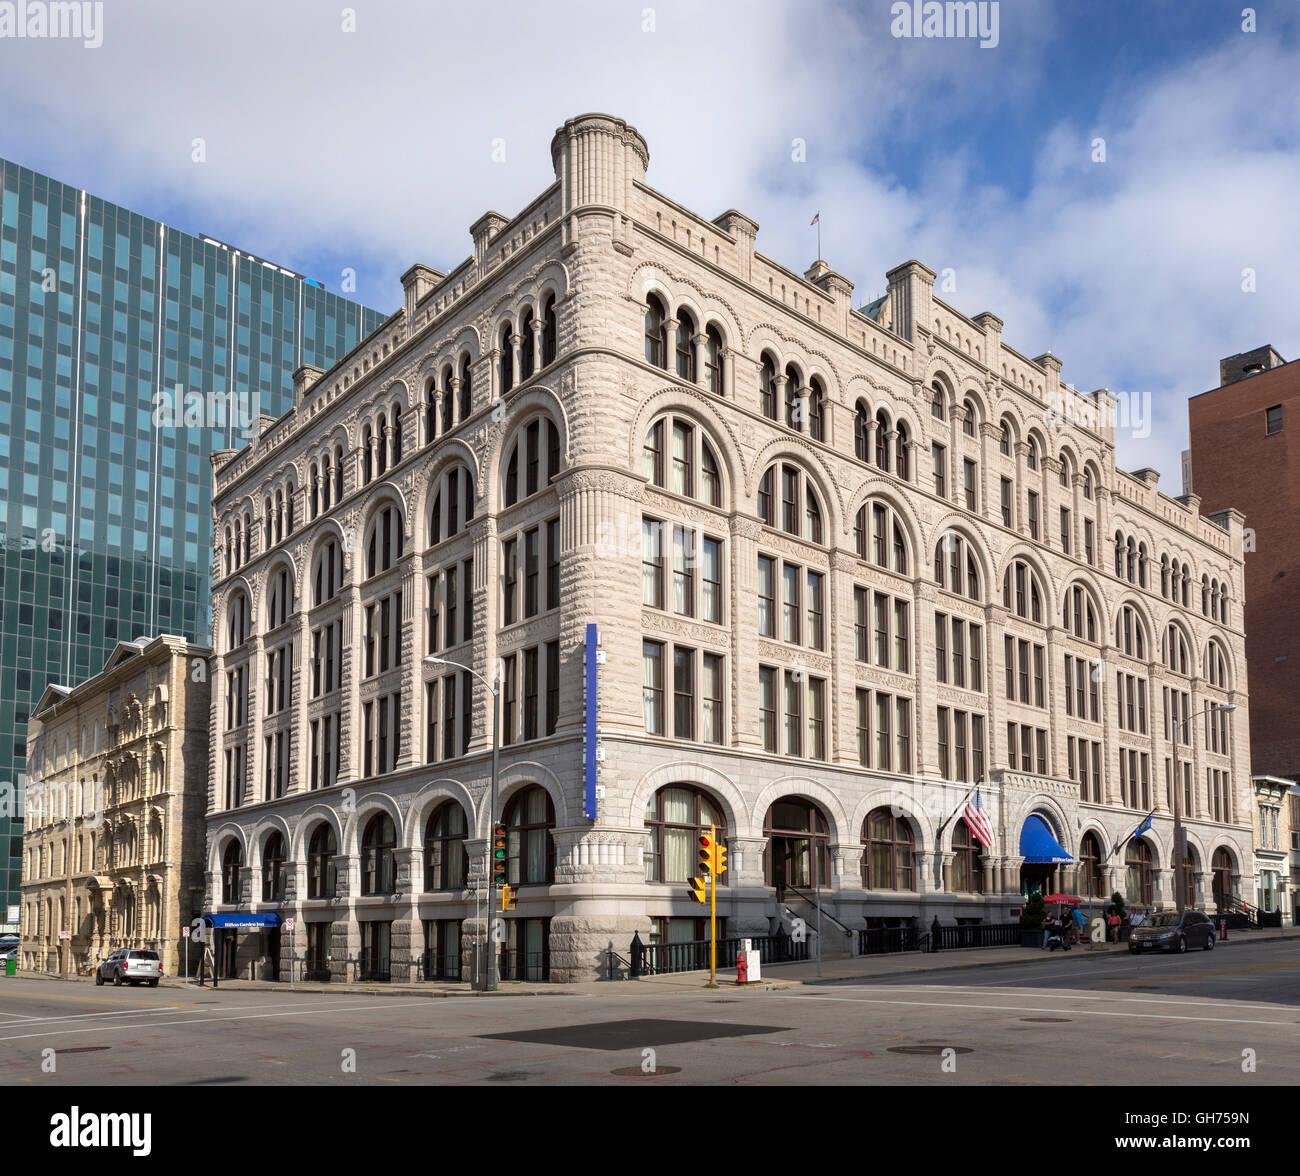 The 1886 Northwestern Mutual Life Insurance Company Home